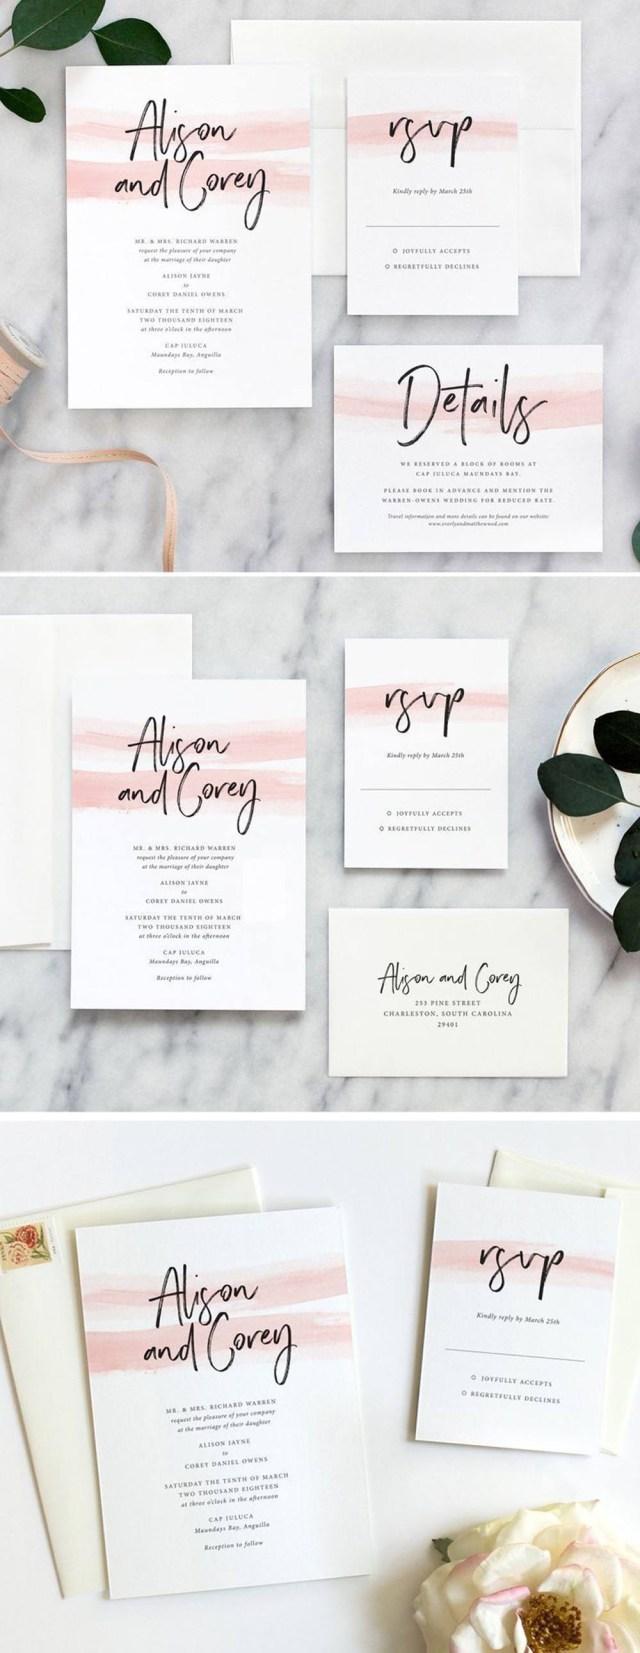 Diy Wedding Invitations Ideas Diy Wedding Invitations Hitchedcouk